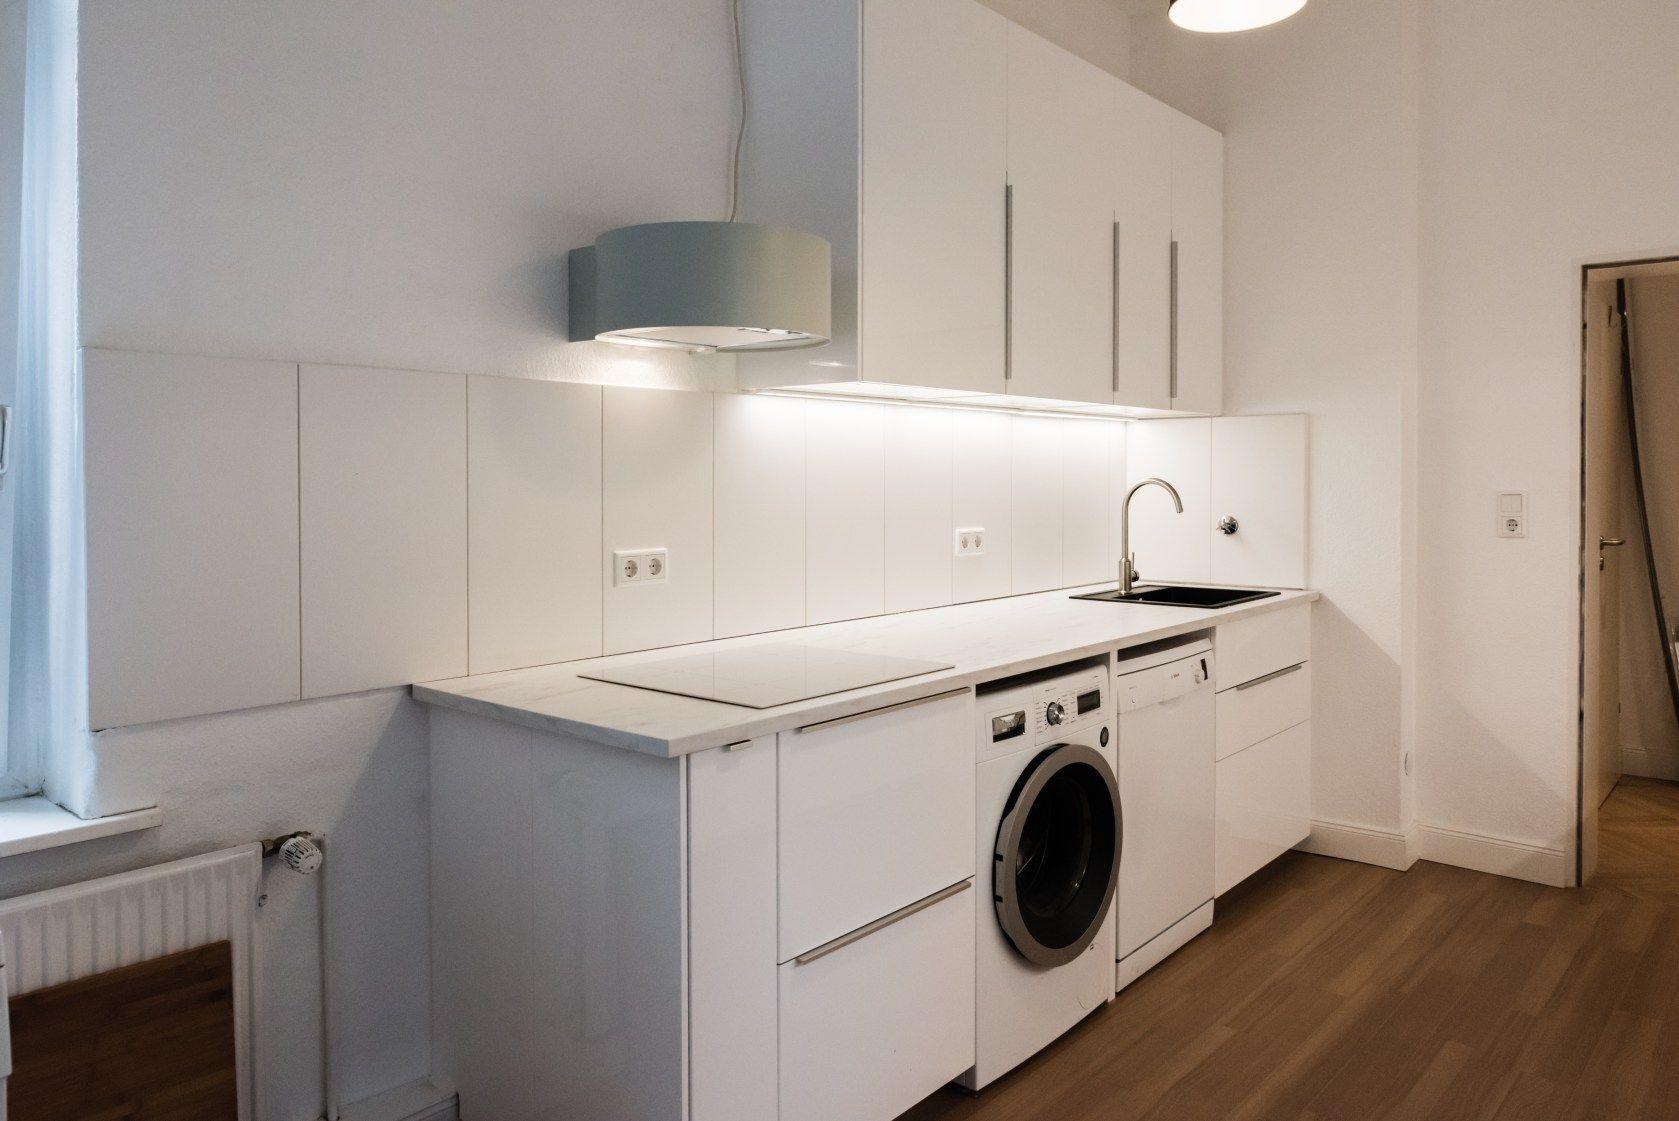 Kuchenkauf Ikea Metod Unsere Erfahrungen Ikea Metod Kitchen Ikea Laundry Washing Machine In Kitchen